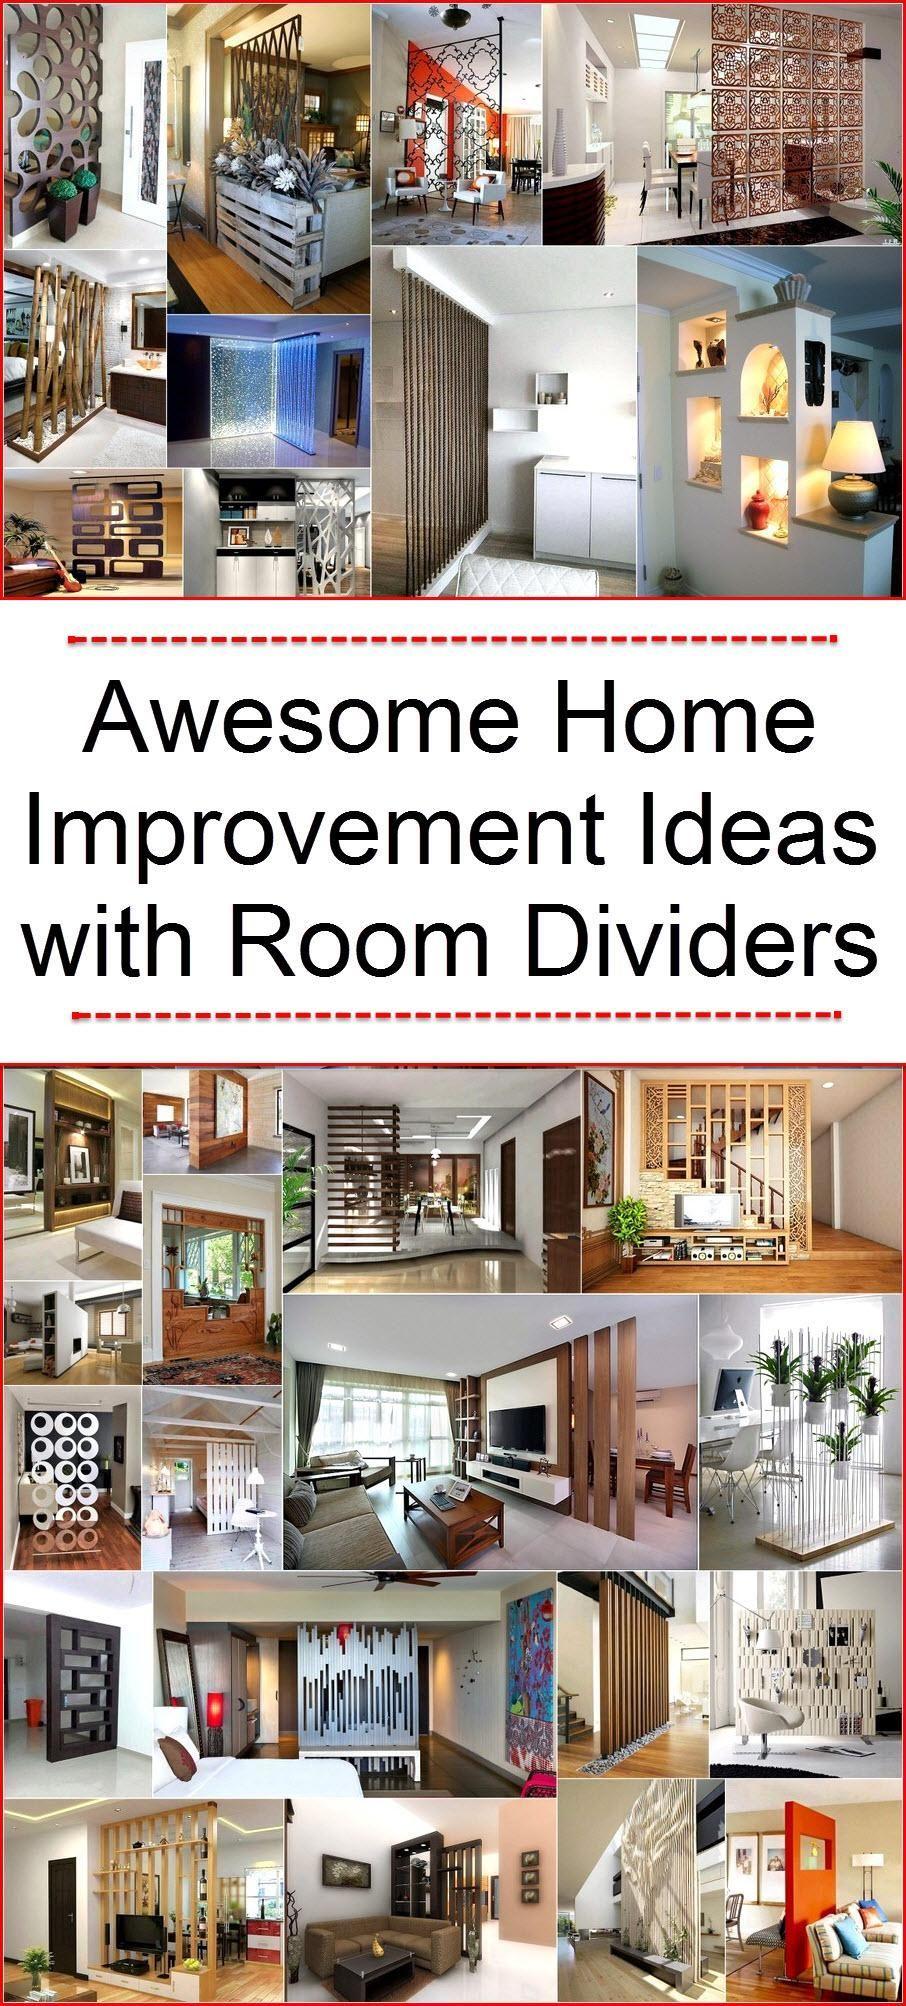 Awesome diy home improvement on  budget ideas homeimprovementdiyonabudget also rh pinterest